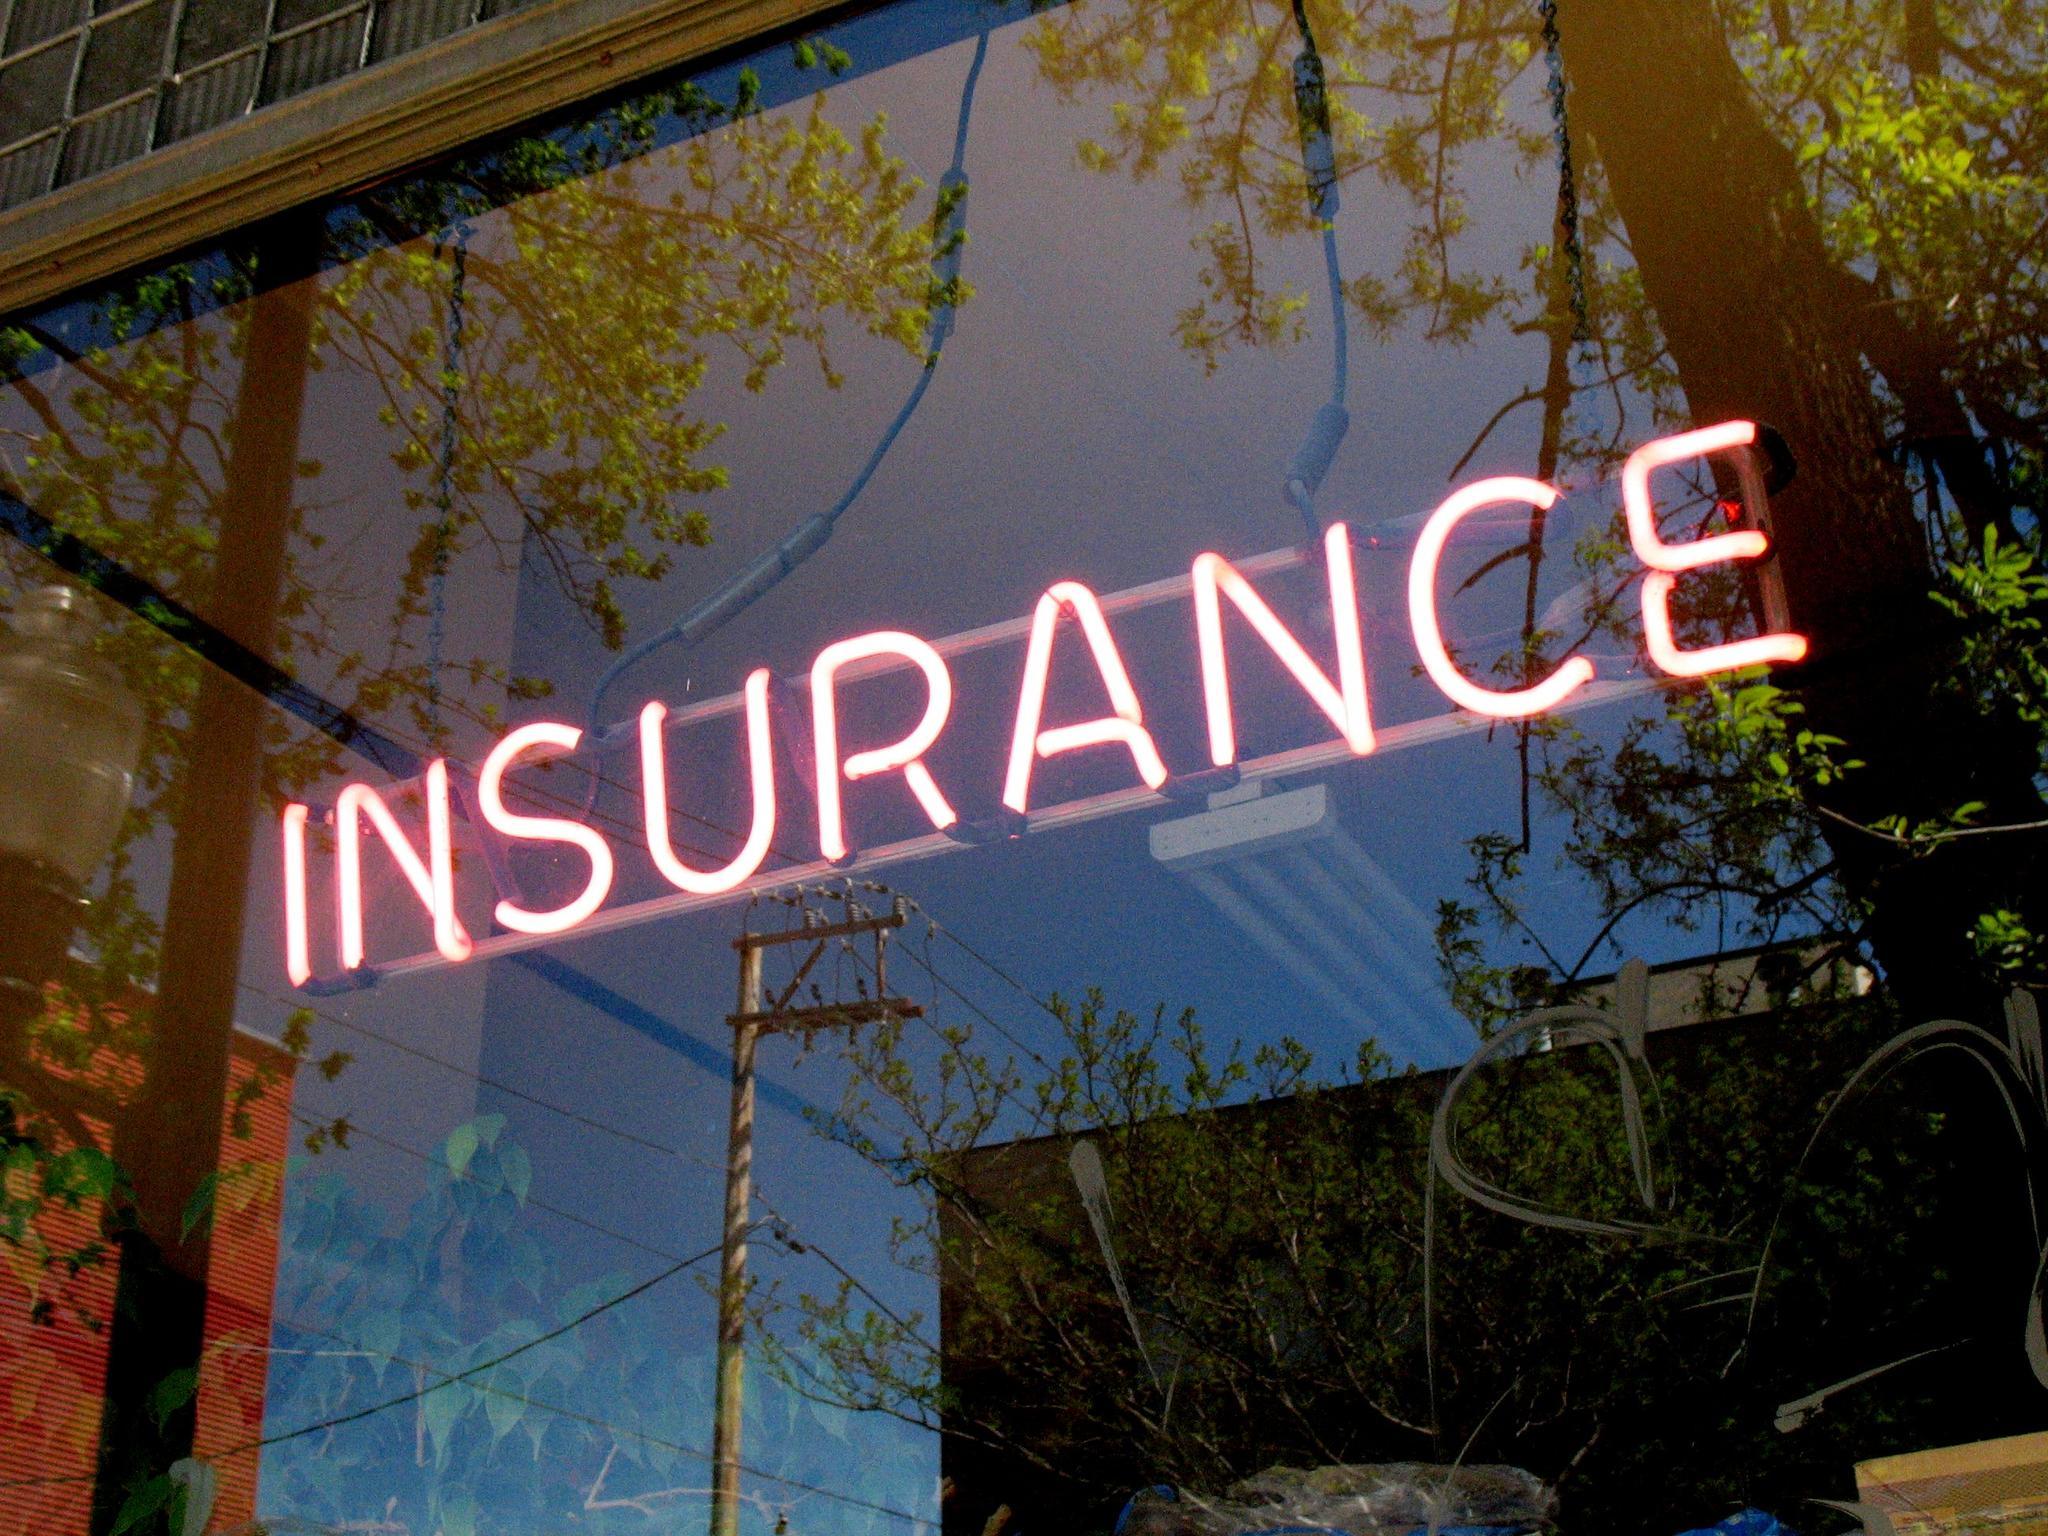 Pride in Being an Insurer